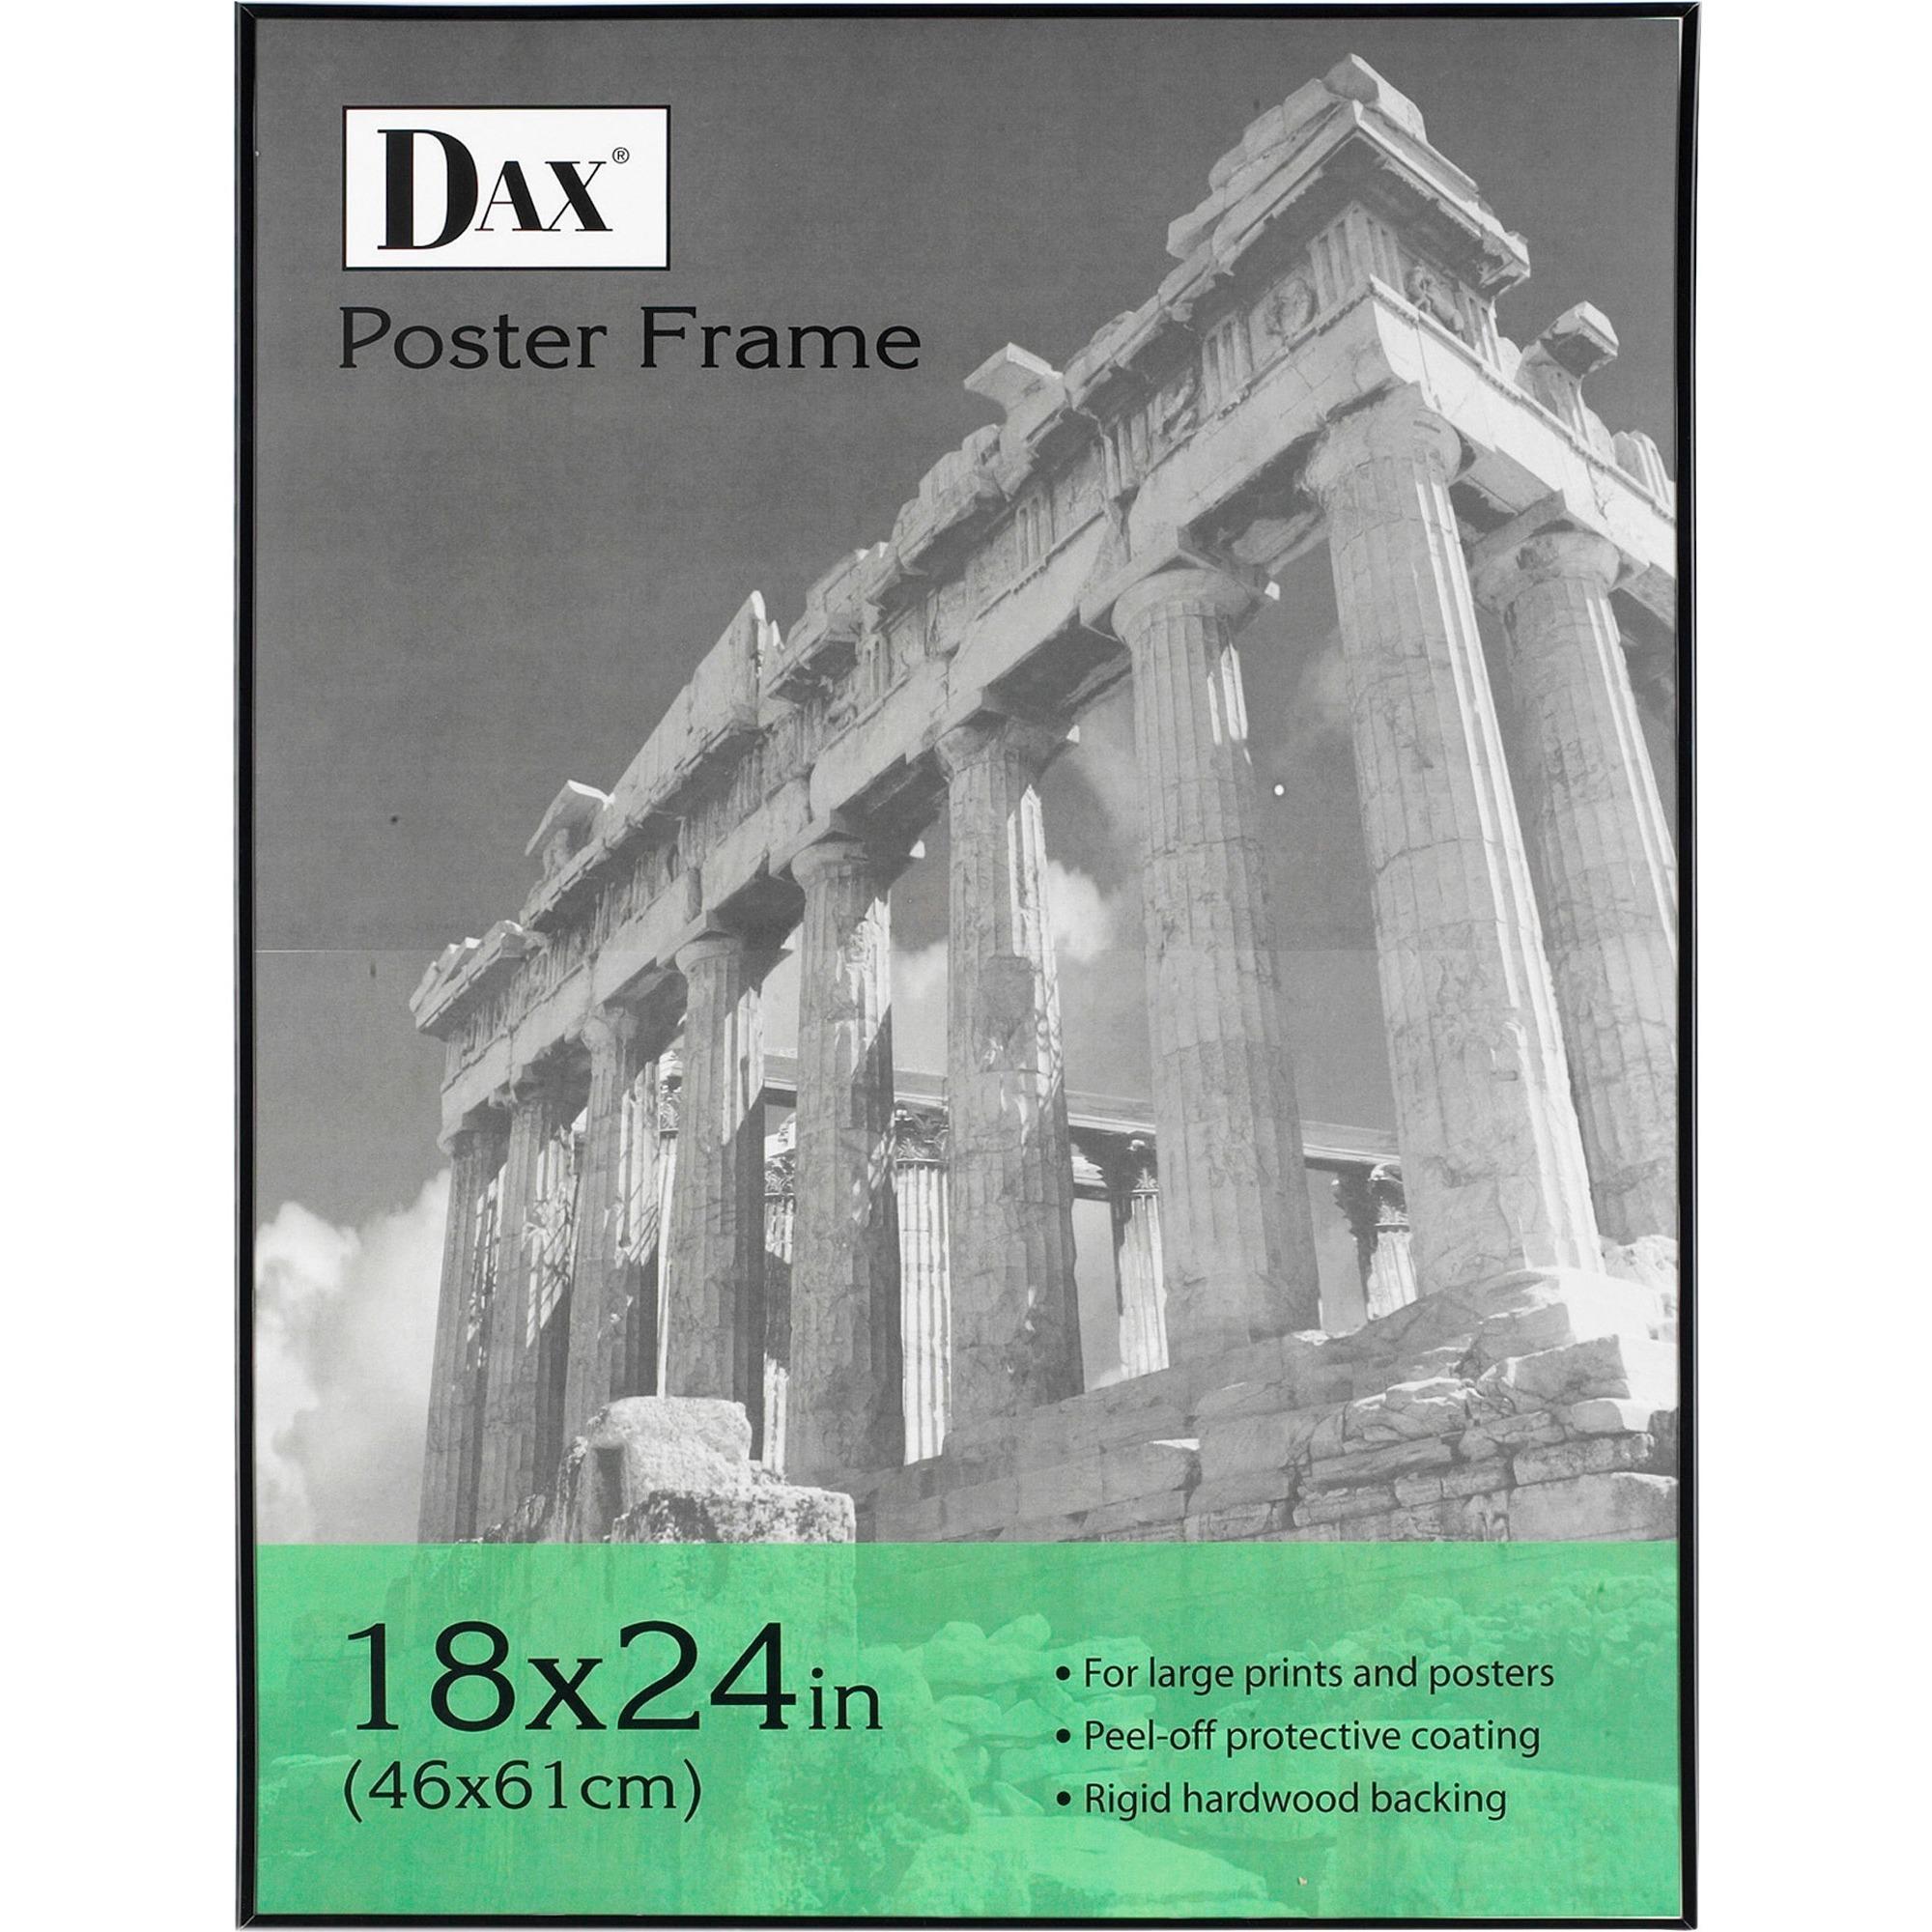 DAXN16016BT DAX U-Channel Wall Poster Frames   GSA Advantage